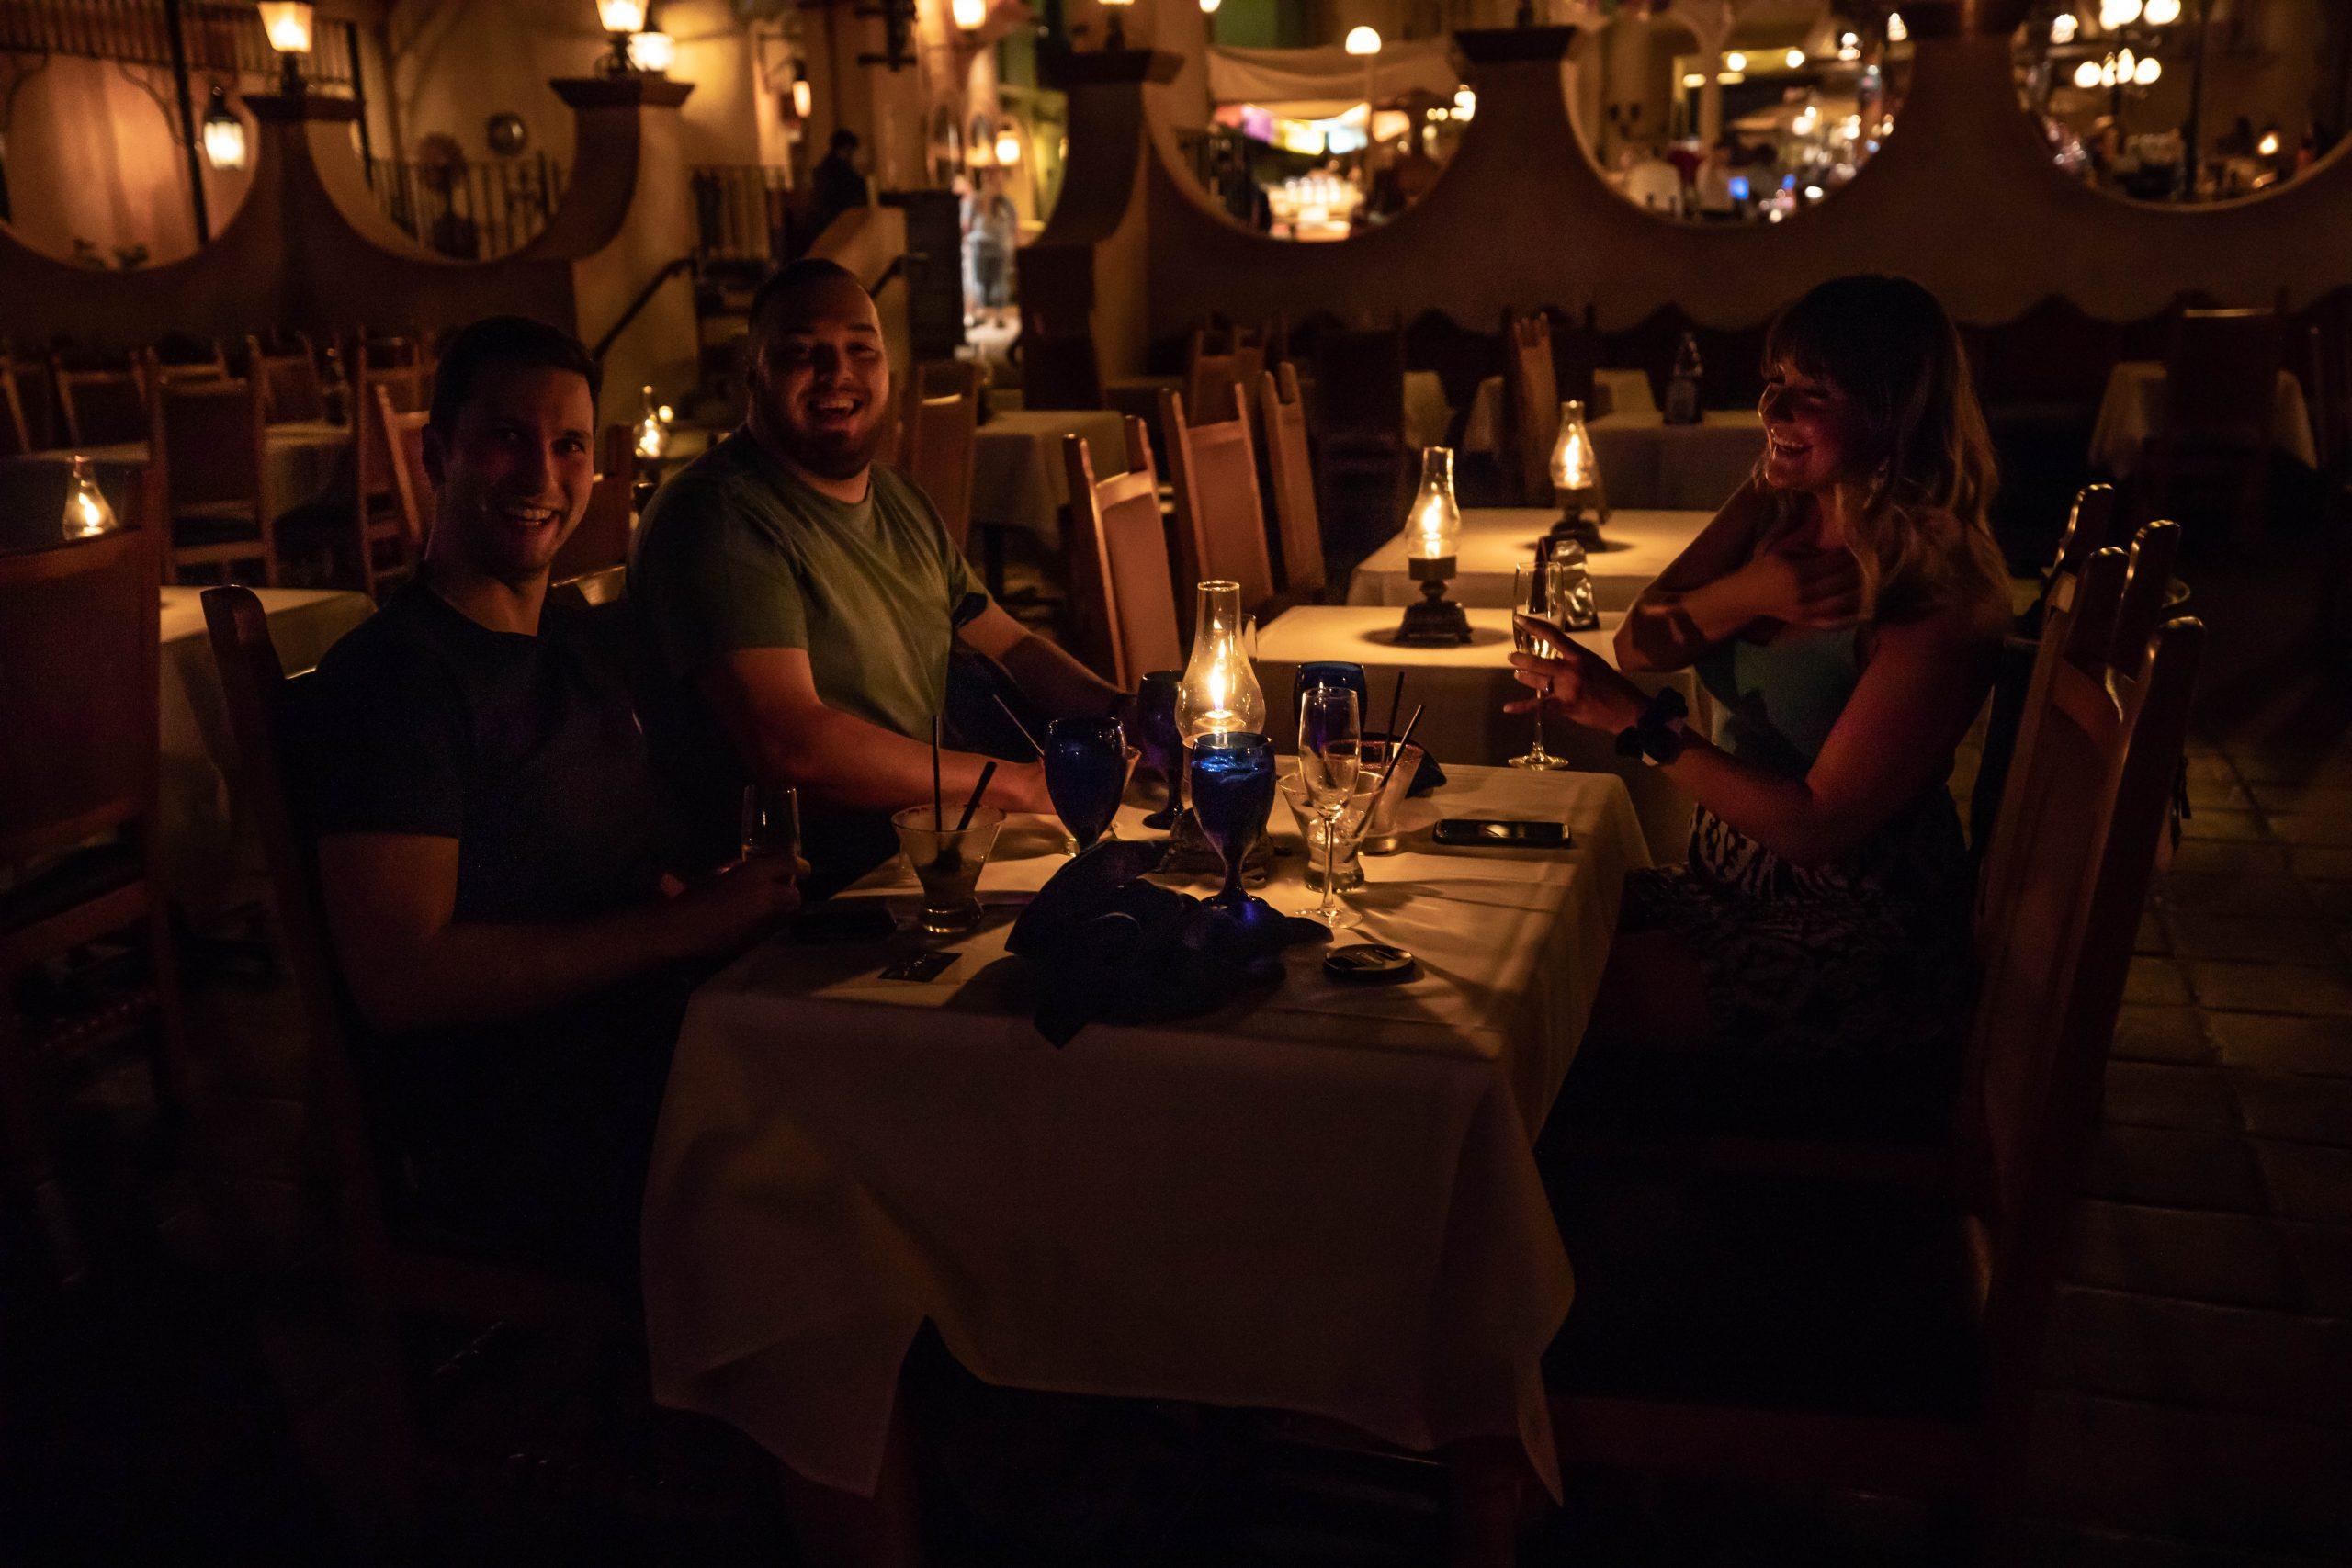 San Angel Inn at Epcot Mexico World Showcase Restaurant at Disney Springs in Orlando, Florida Luxury Travel Guide by Annie Fairfax